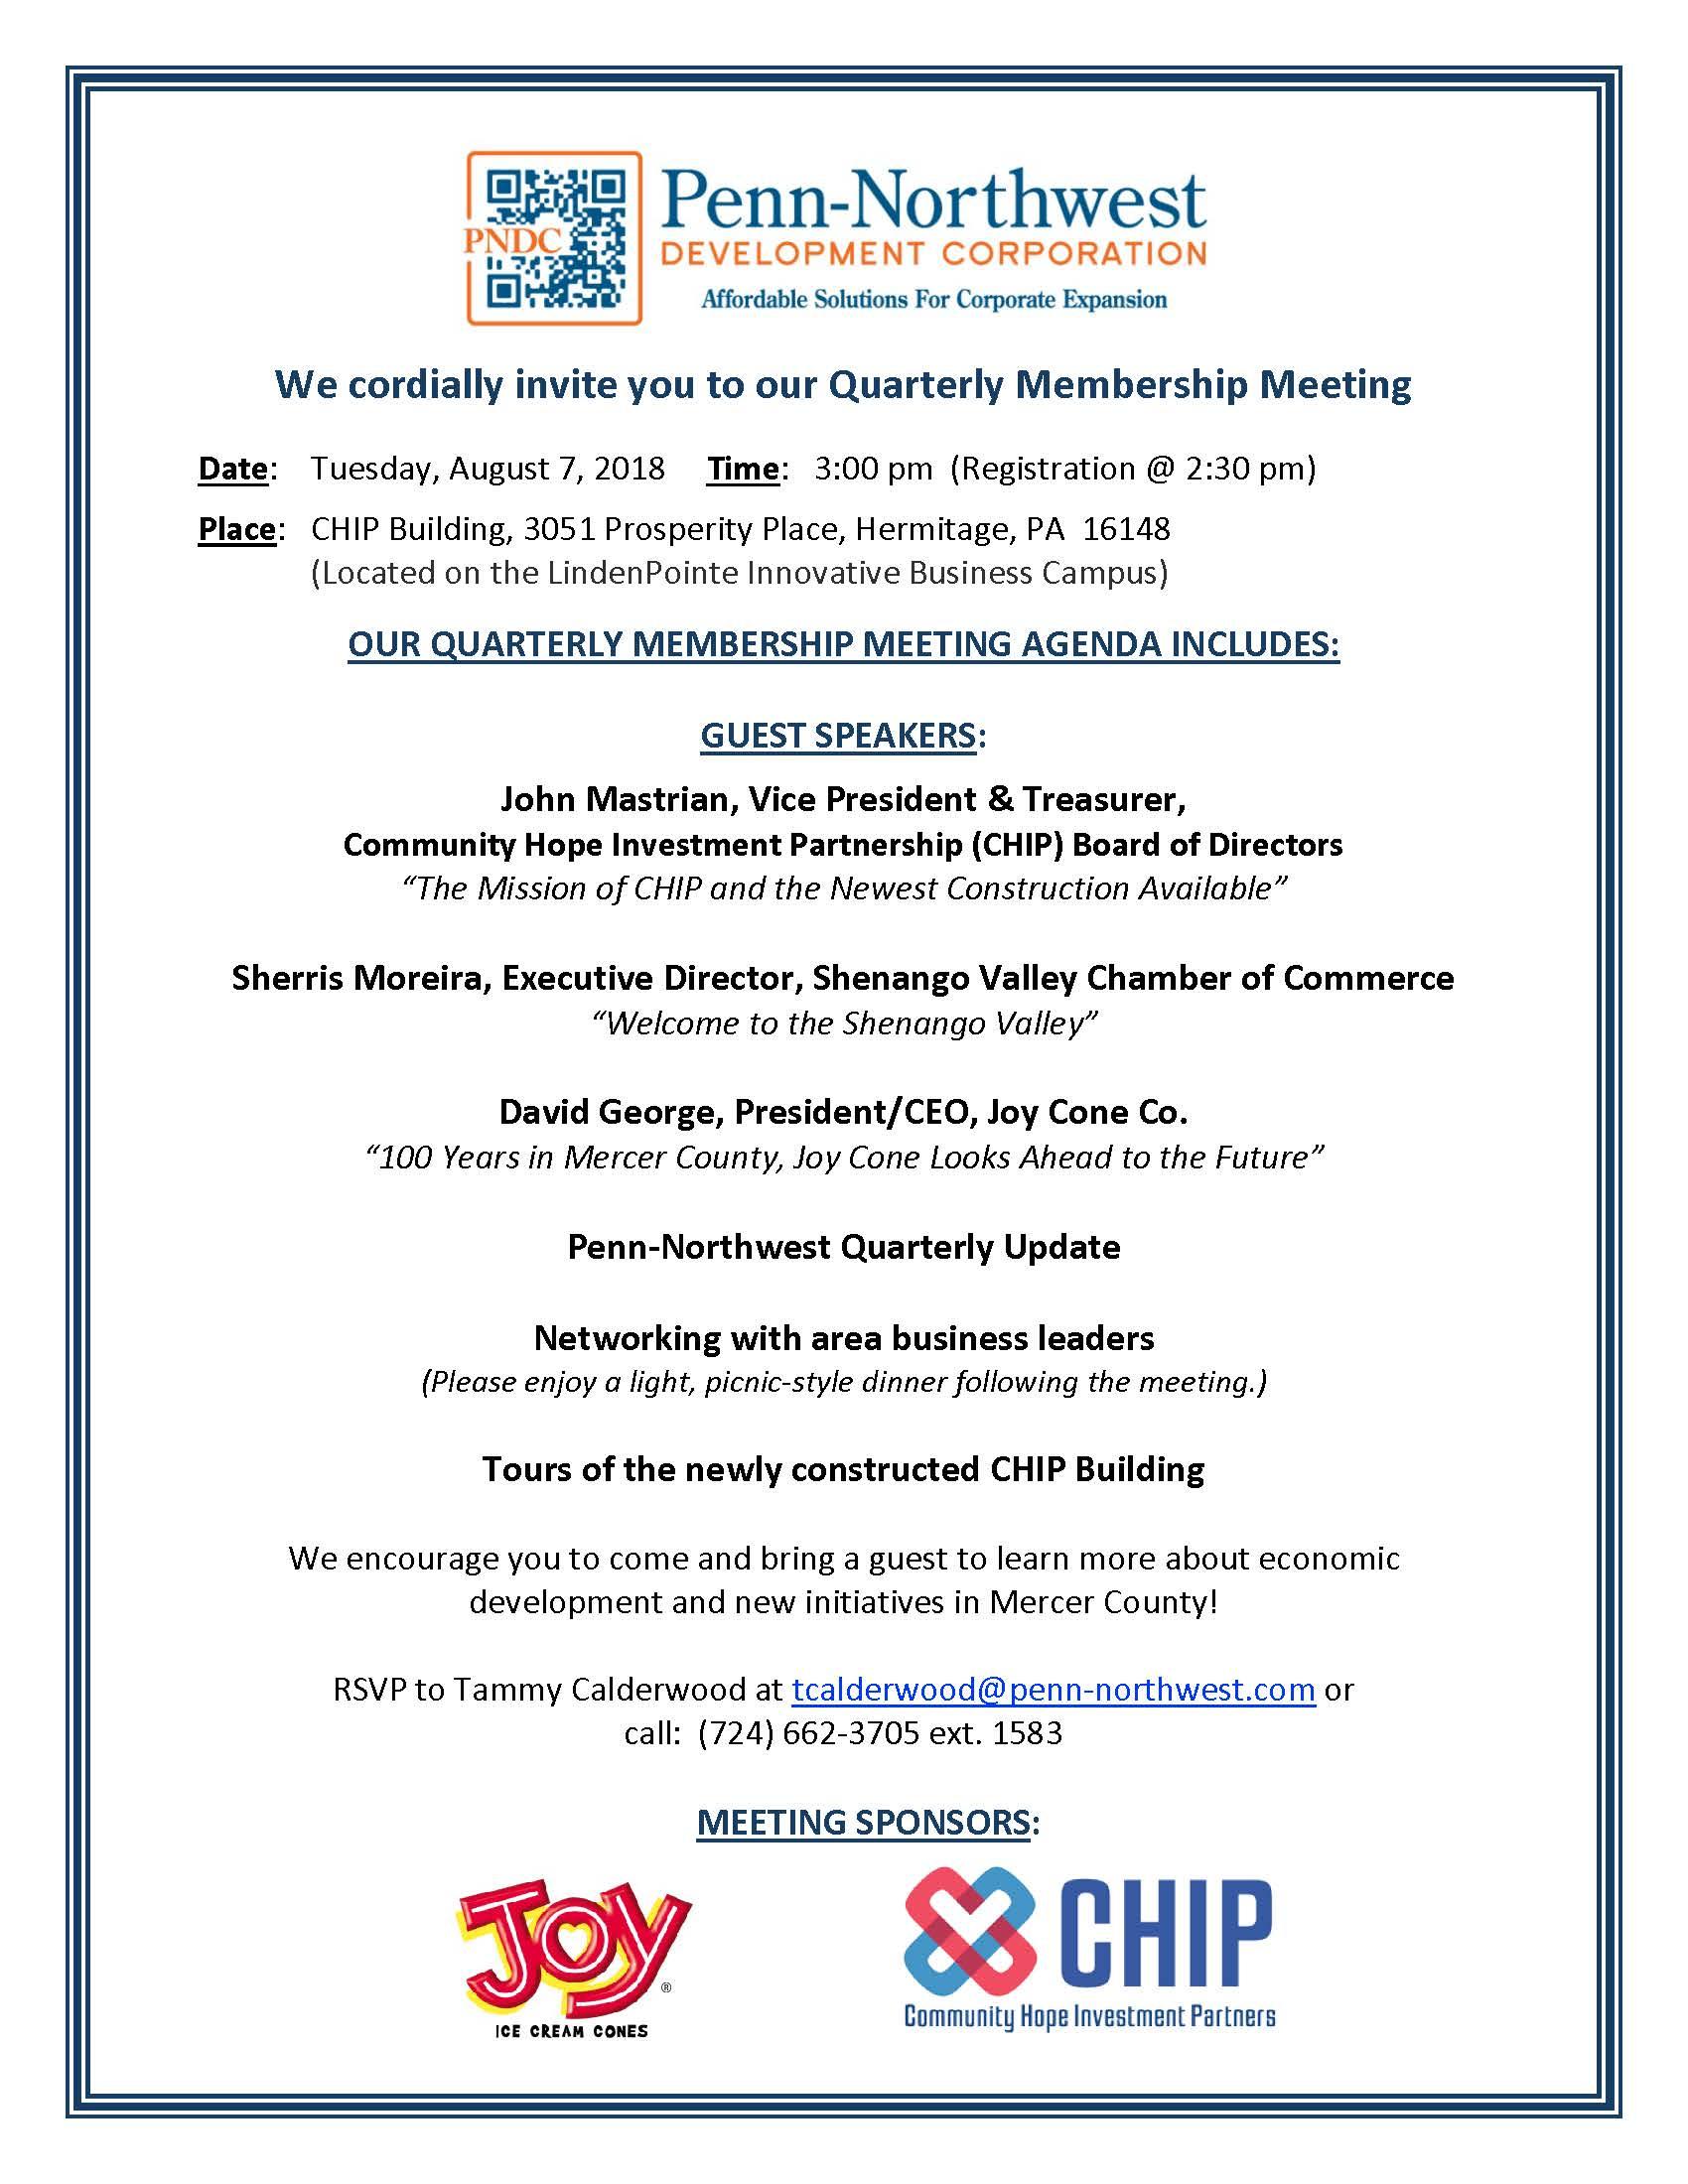 Penn-Northwest Development Corp. – Make it in Mercer County. PA